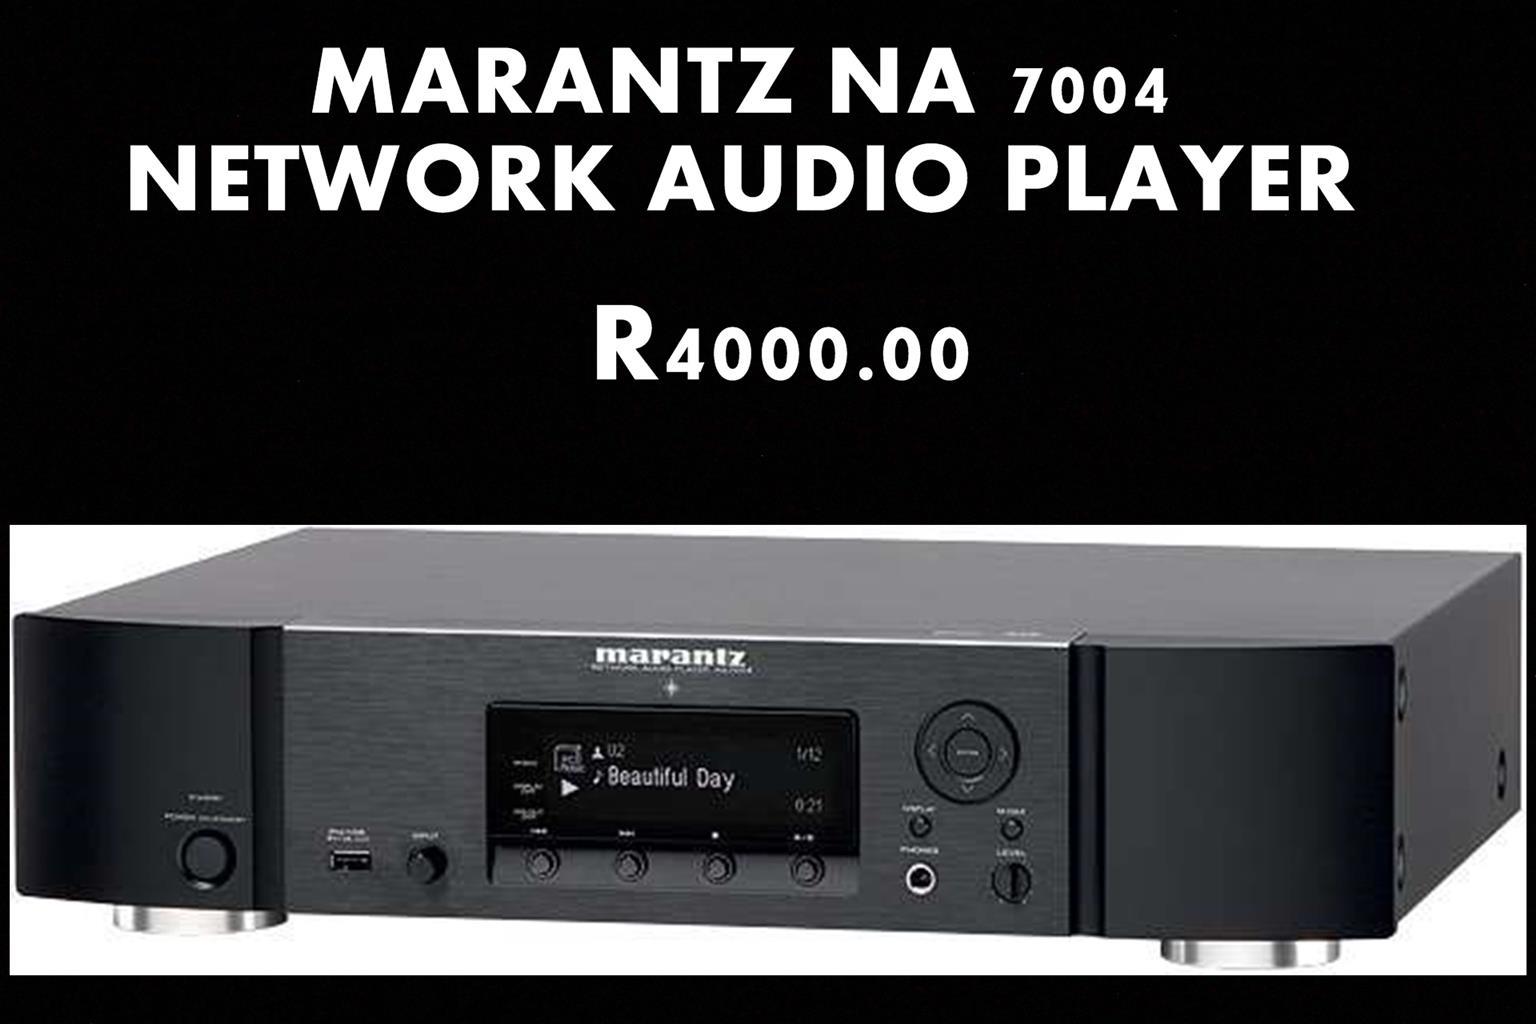 MARANTZ NETWORK AUDIO PLAYER NA7004